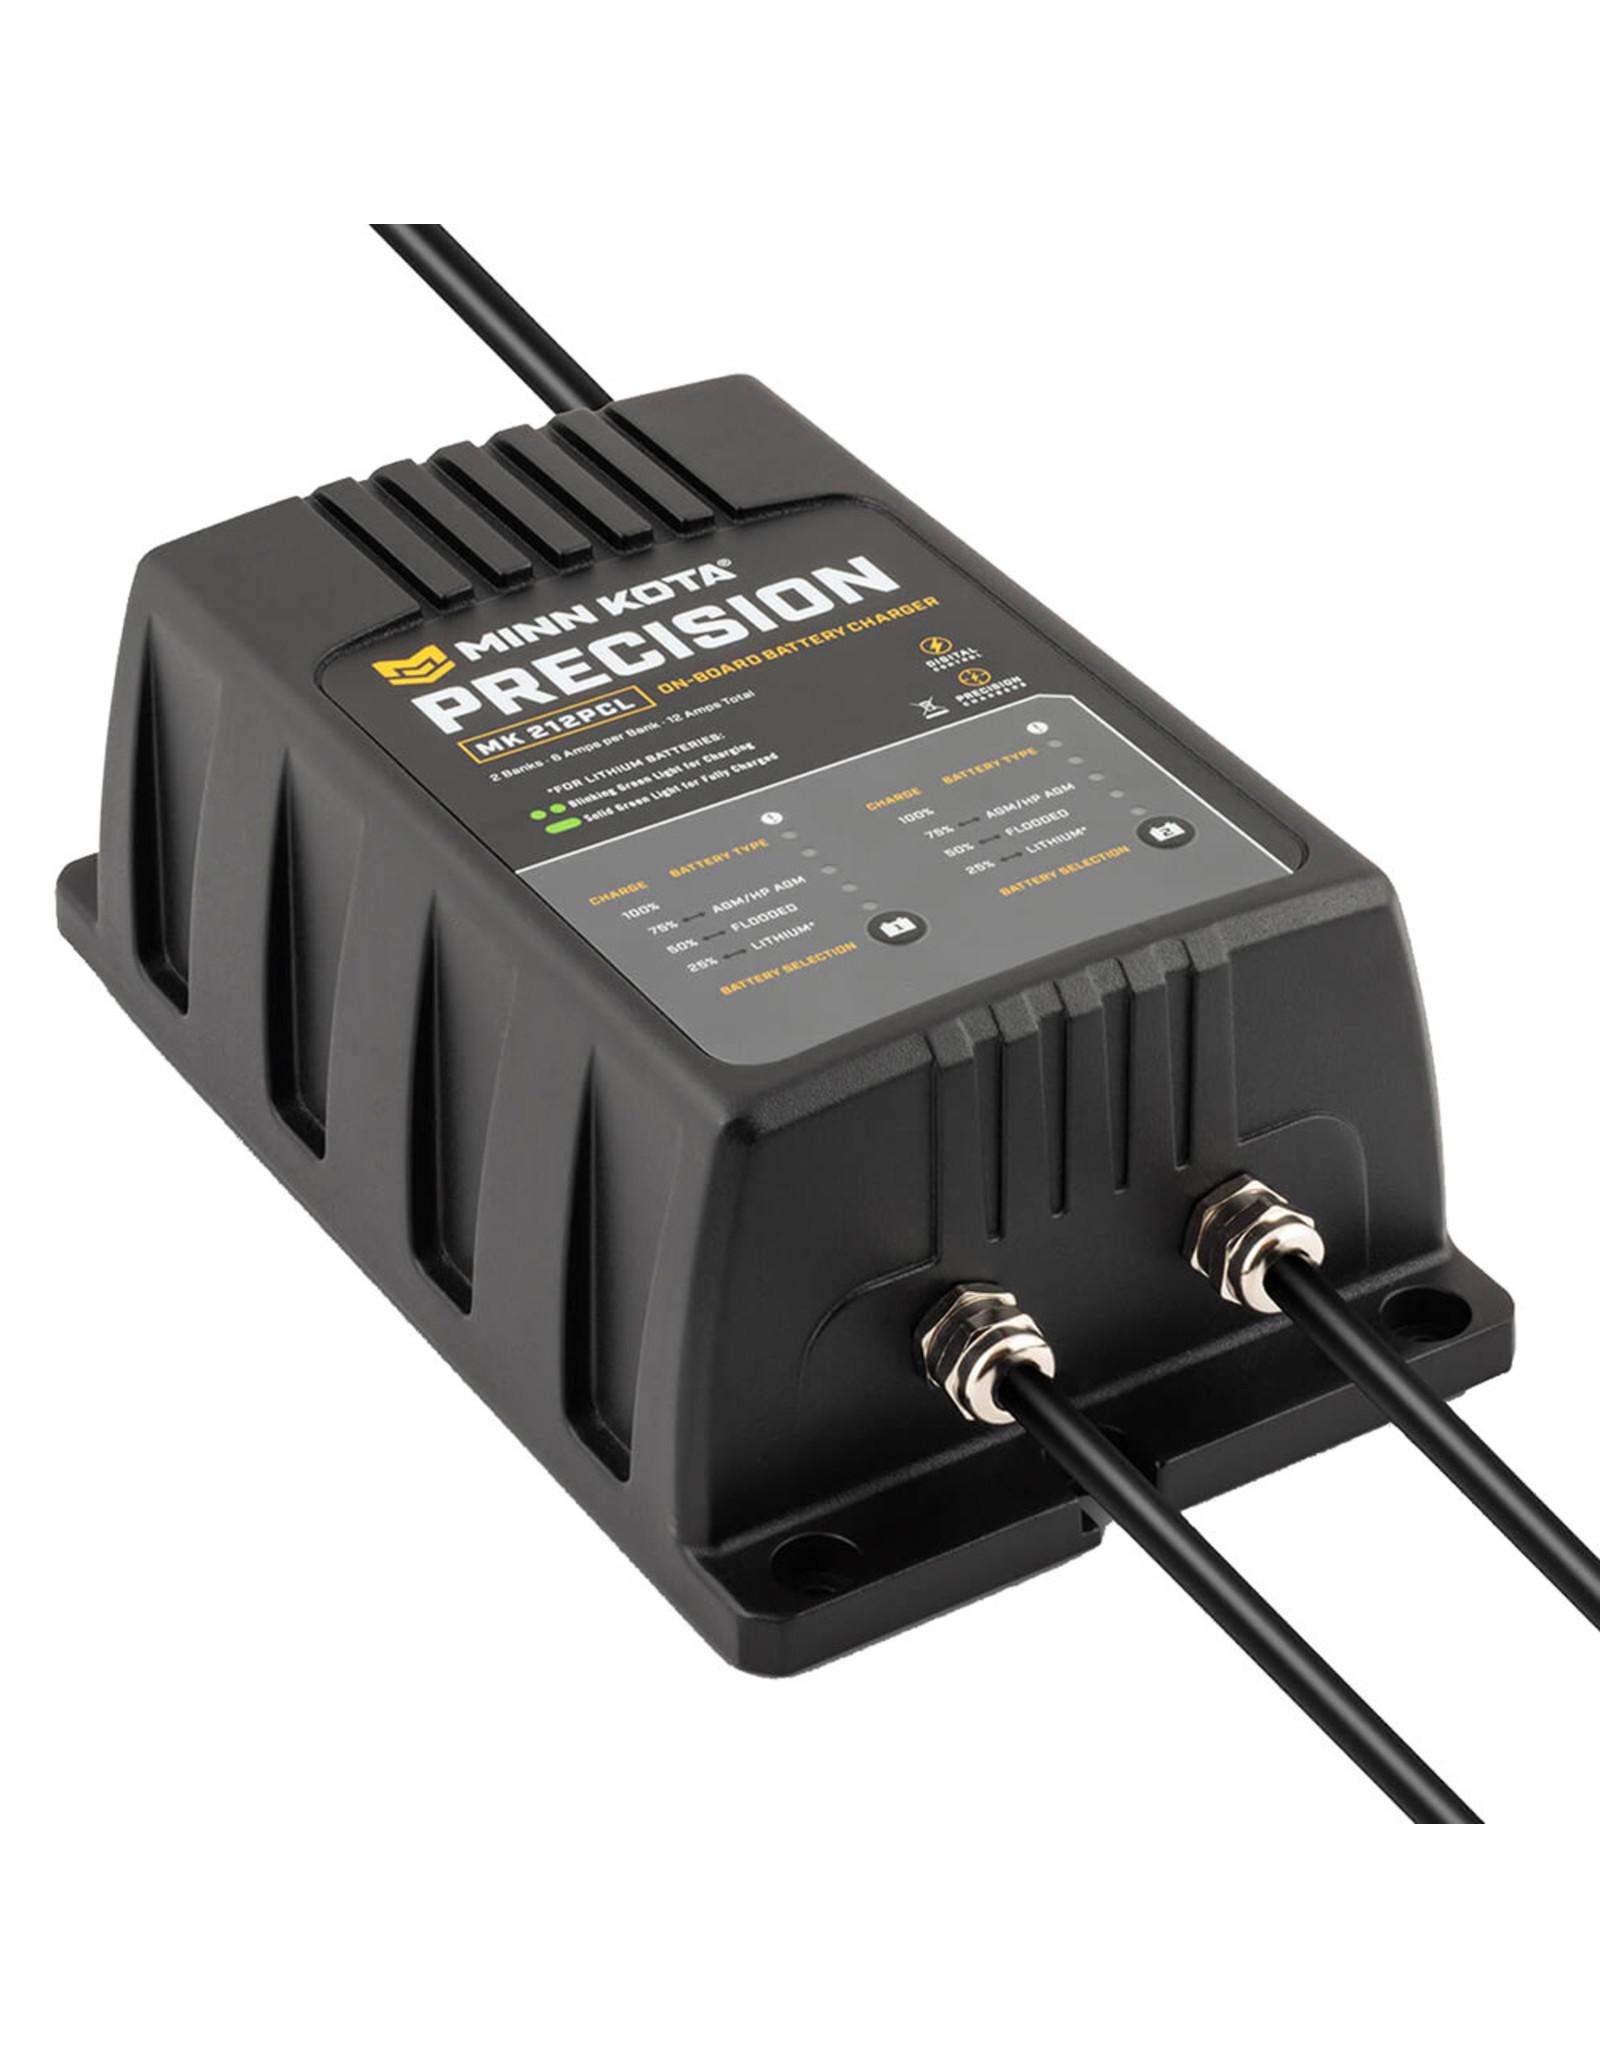 Minn Kota MK-212 PCL 2 Bank x 6 AMP LI Optimized Charger